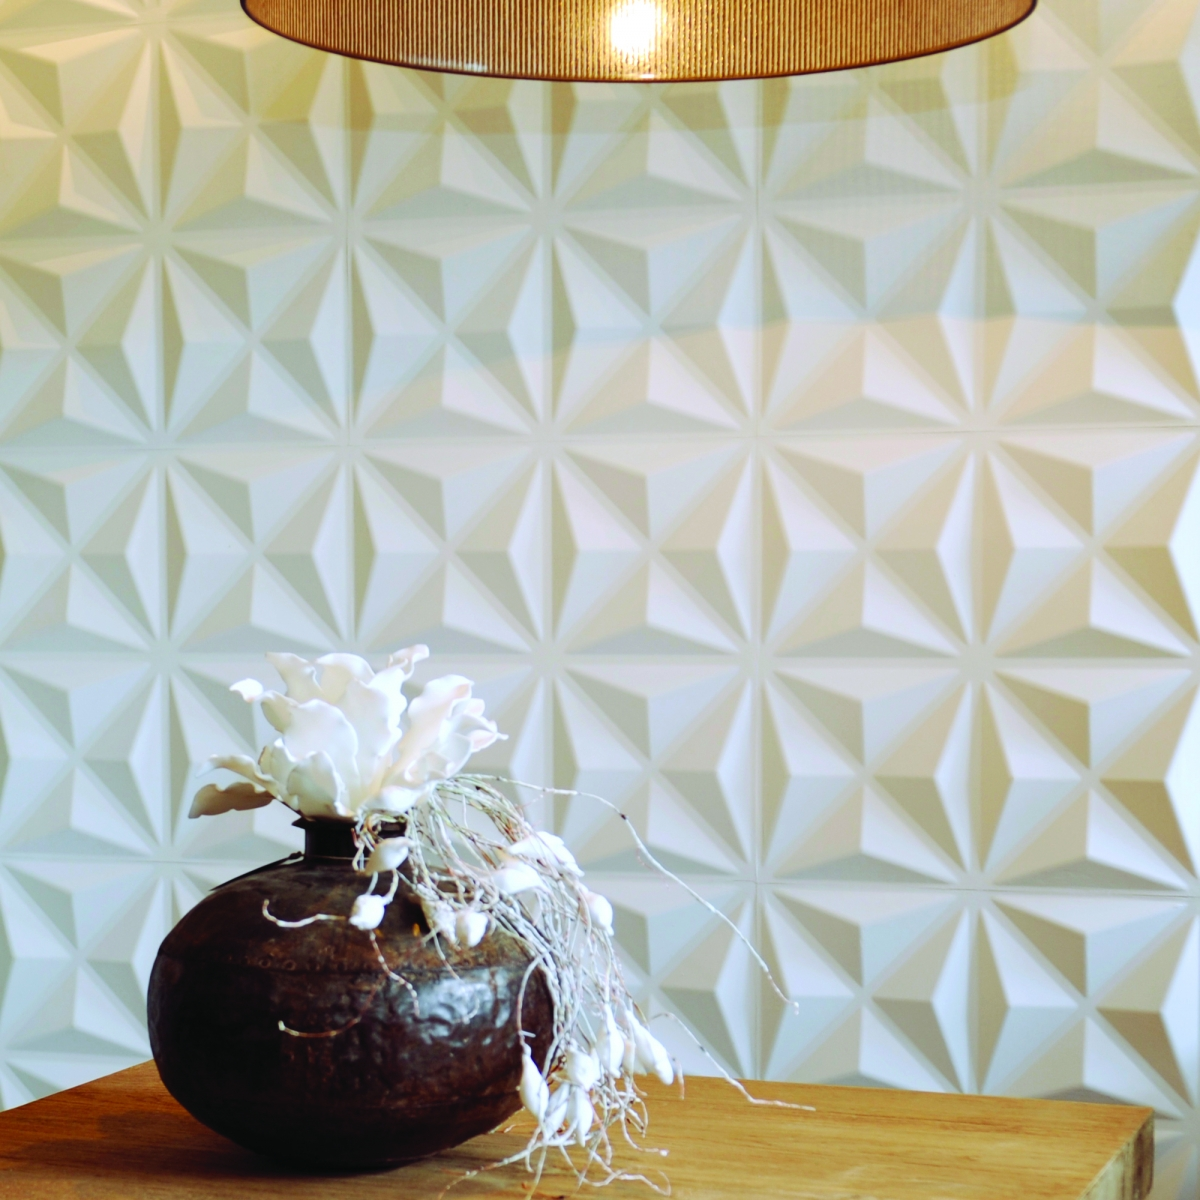 Panouri decorative 3D Cullinans WallArt, 12 placi 50x50cm